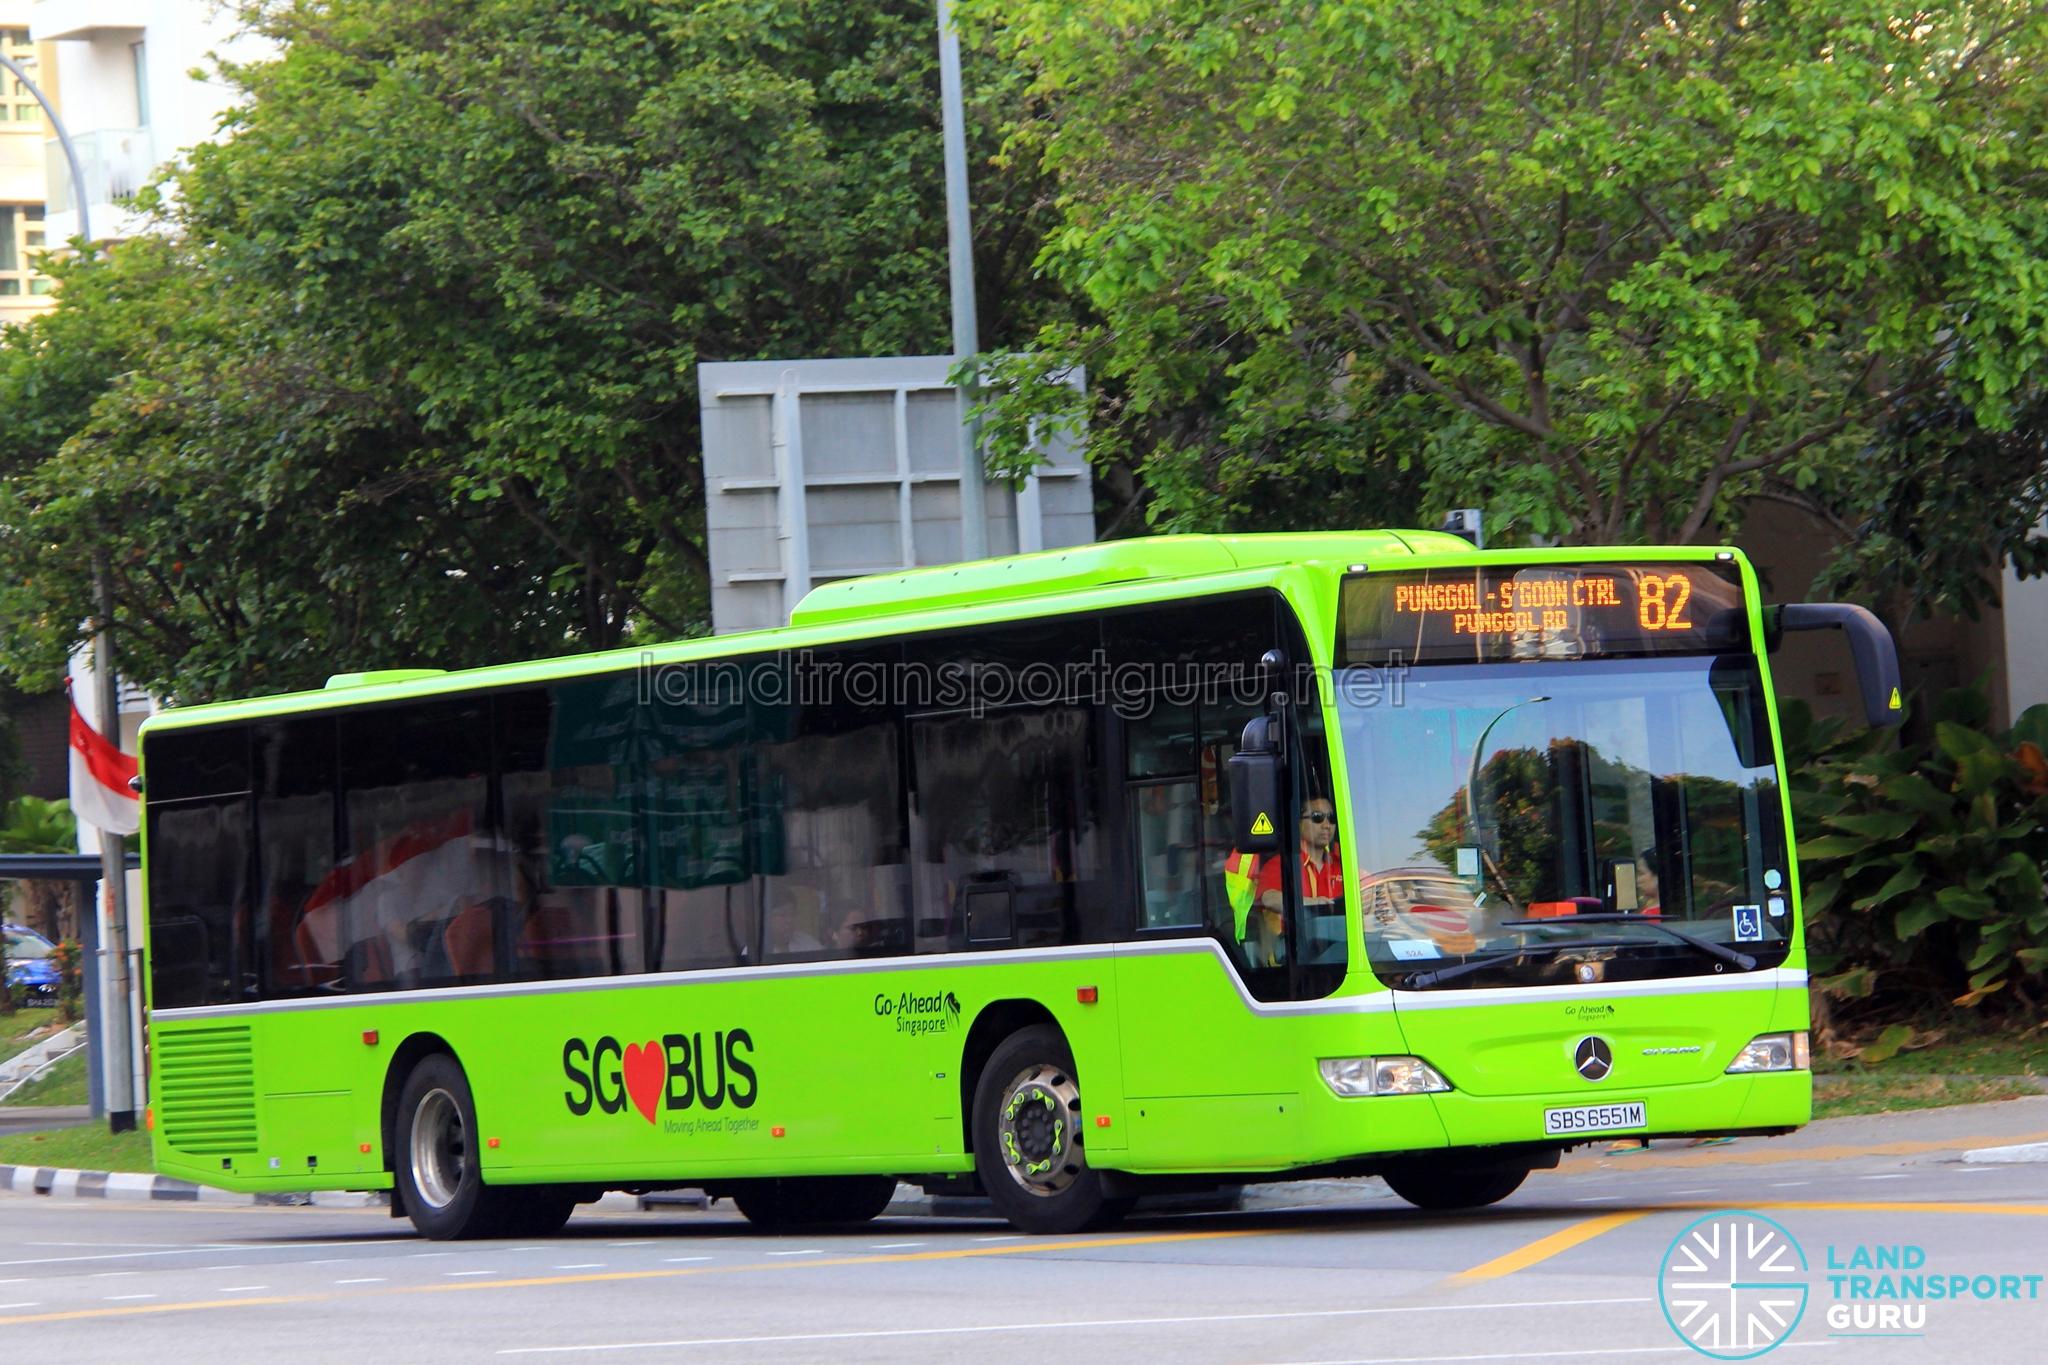 go-ahead bus service 82 | land transport guru